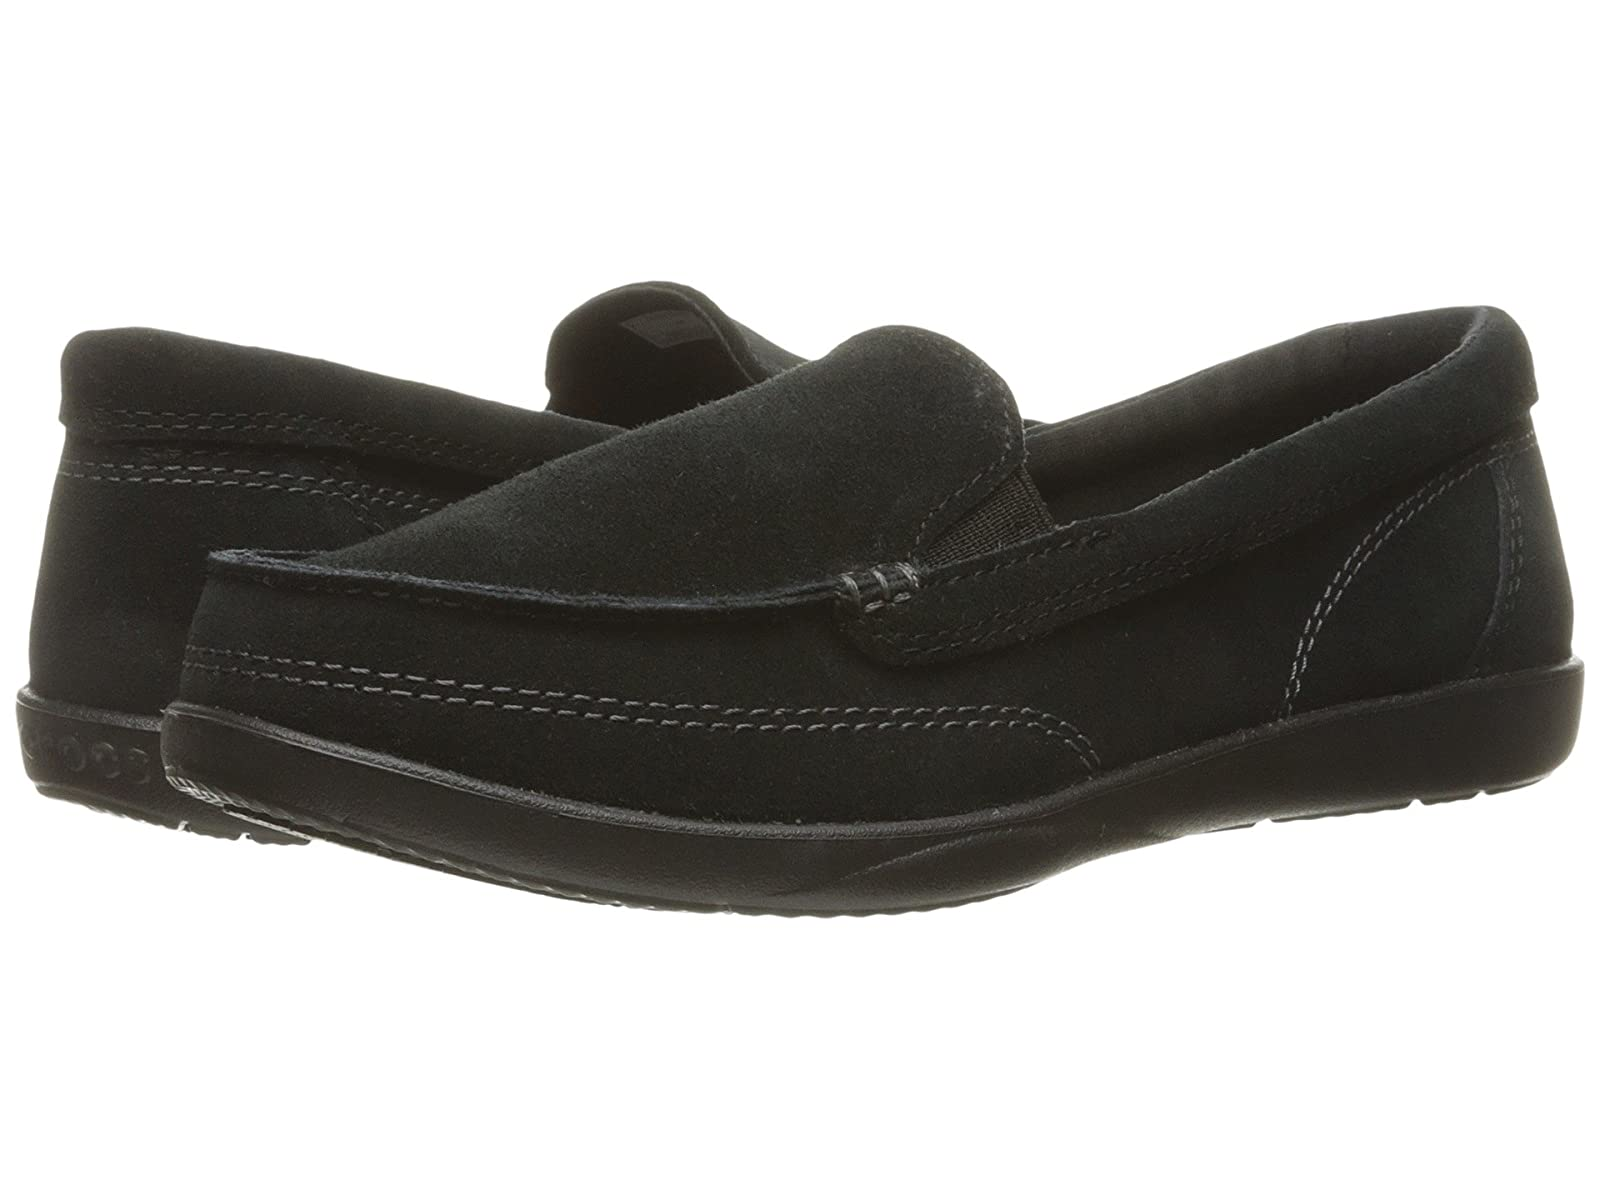 Crocs Walu II Suede LoaferCheap and distinctive eye-catching shoes